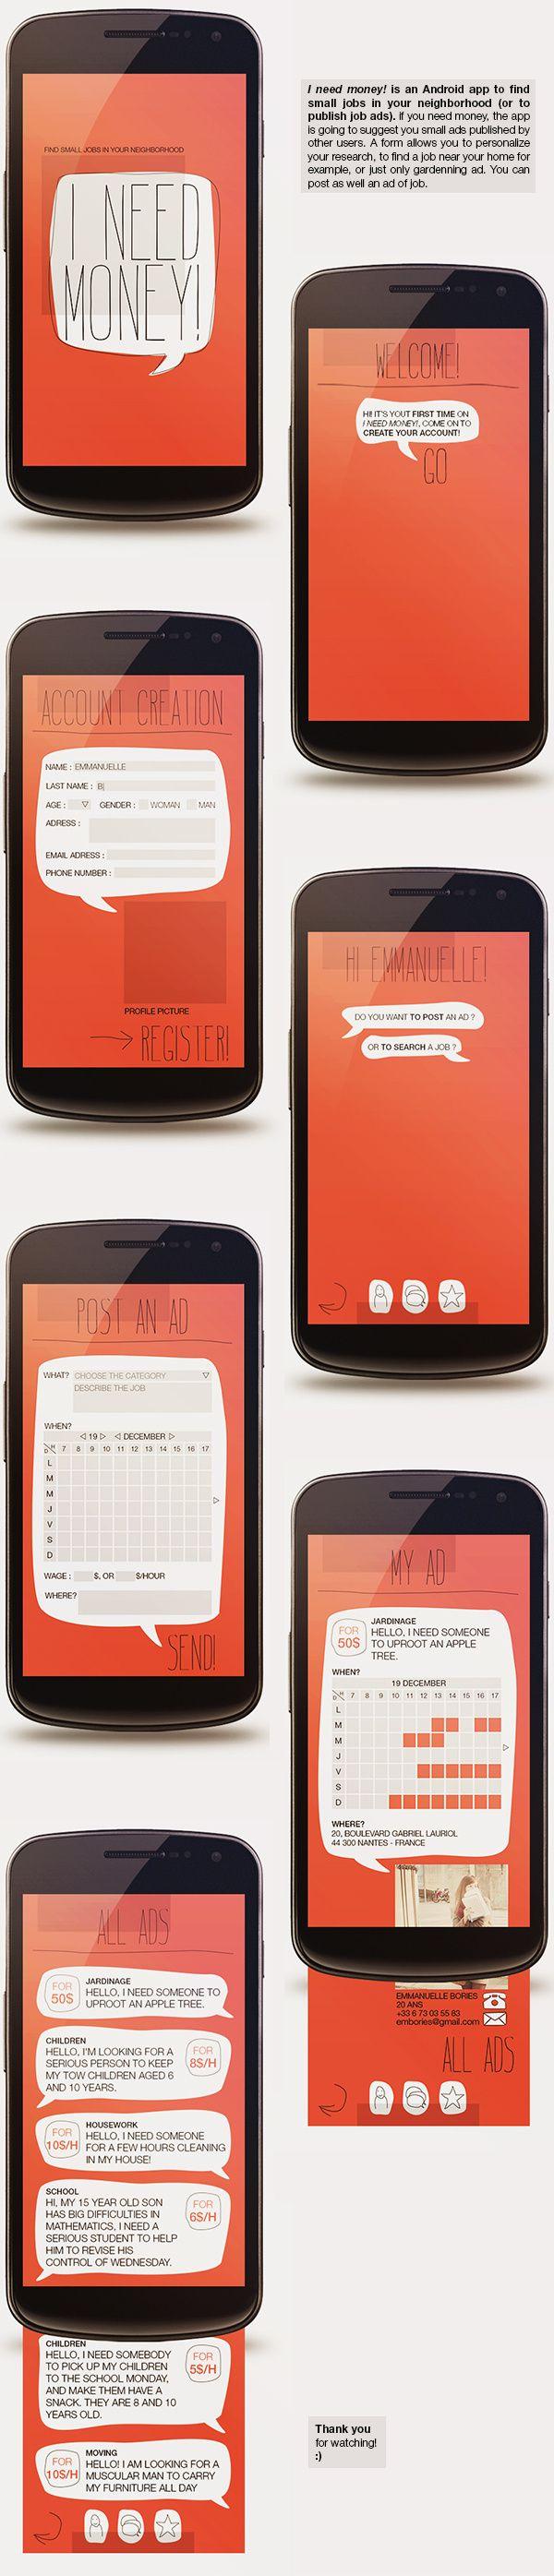 51 best game app design images on pinterest app design game app android app 2013 by emmanuelle bories via behance